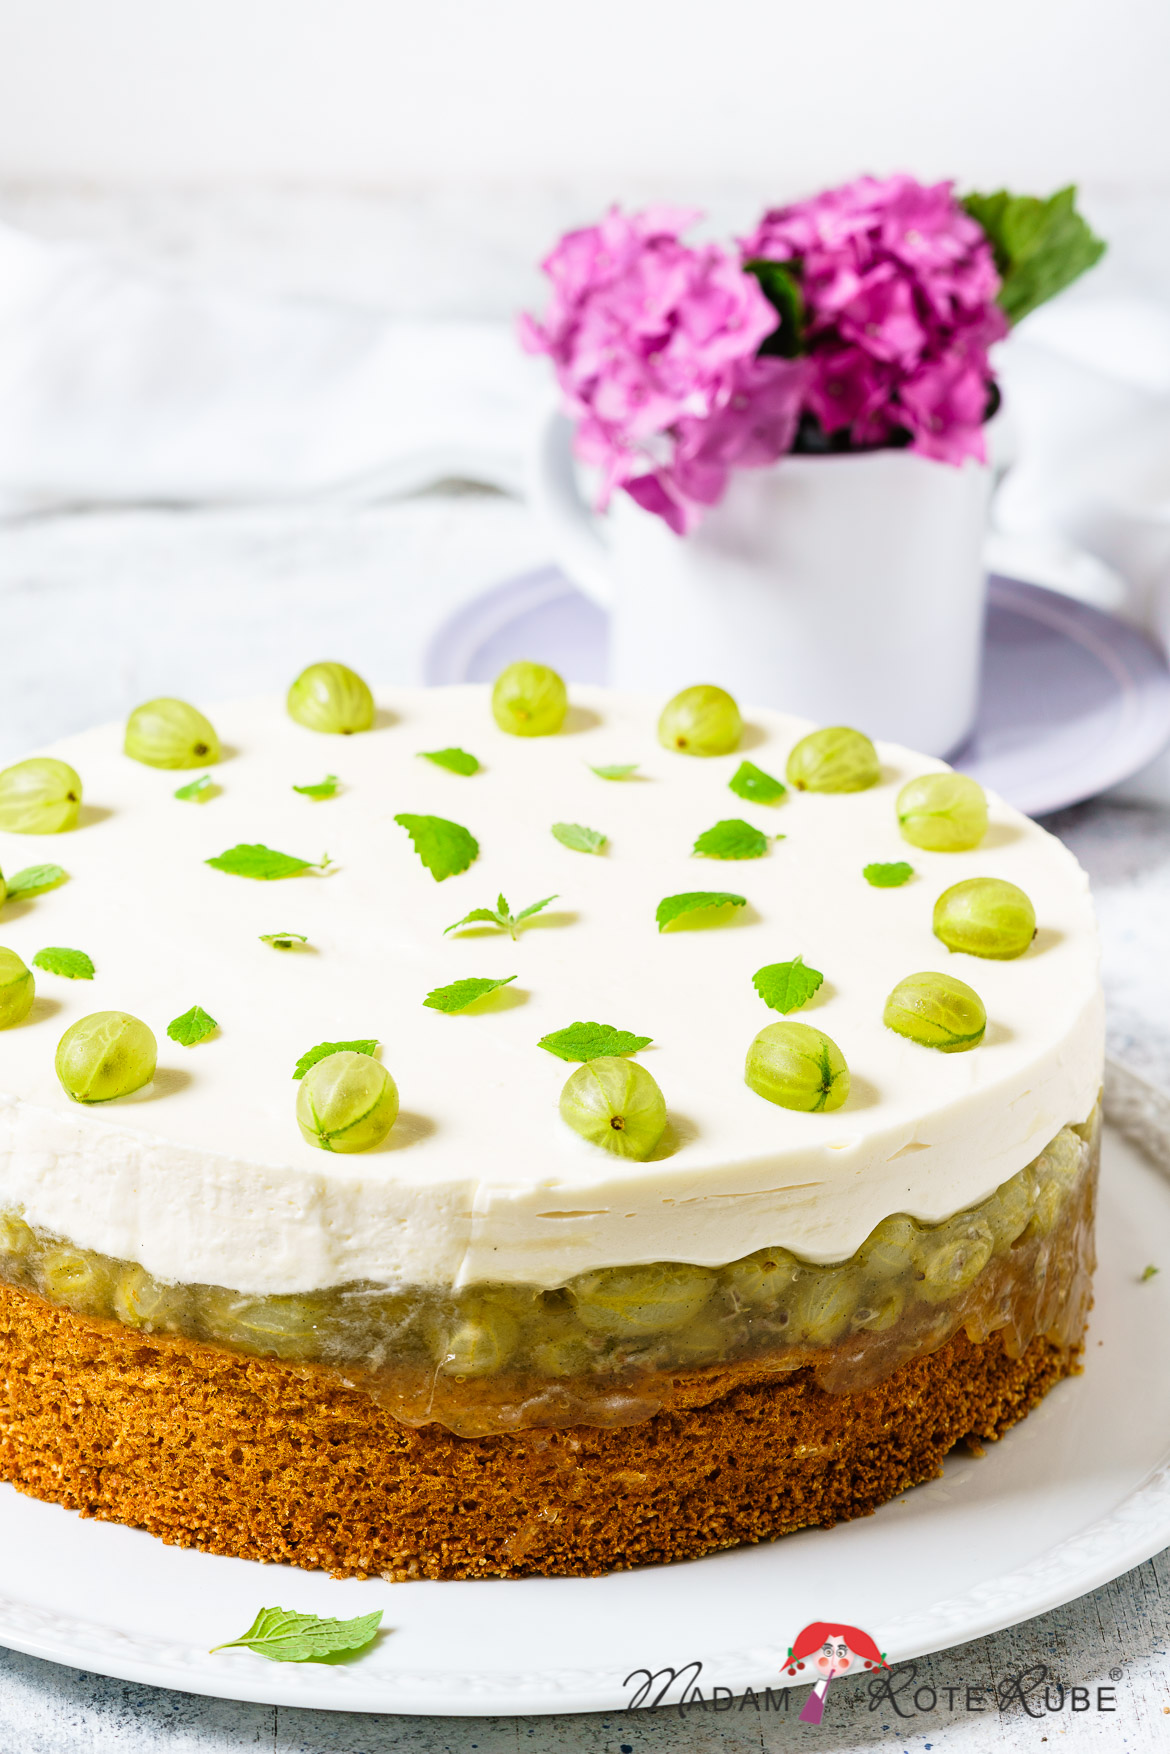 Madam Rote Rübe - Stachelbeer-Prosecco-Torte mit Dinkelvollkorn-Biskuit